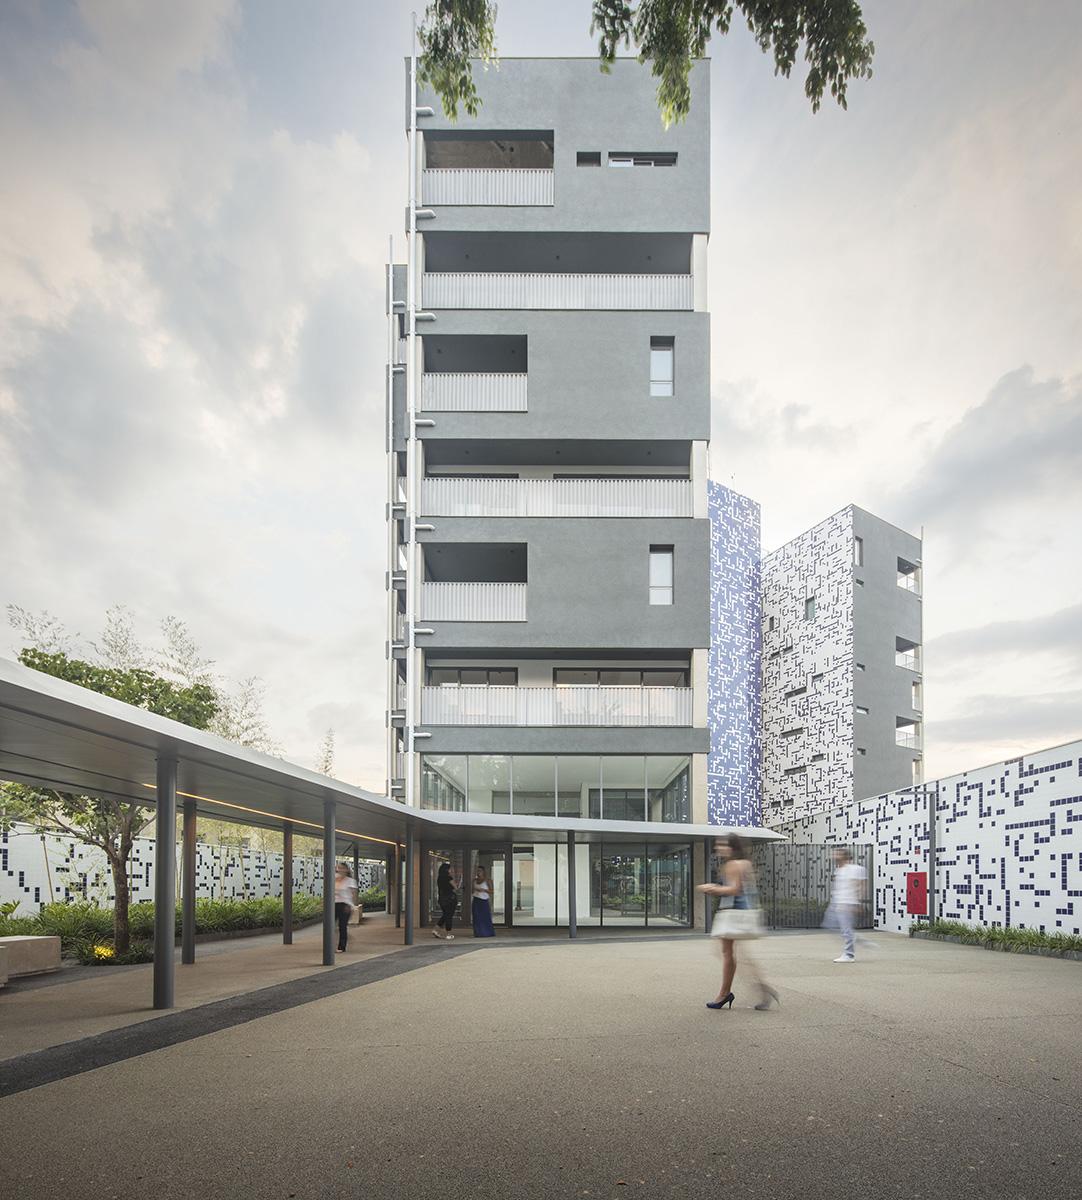 02-arapiraca-triptyque-architecture-foto-fernando-guerra